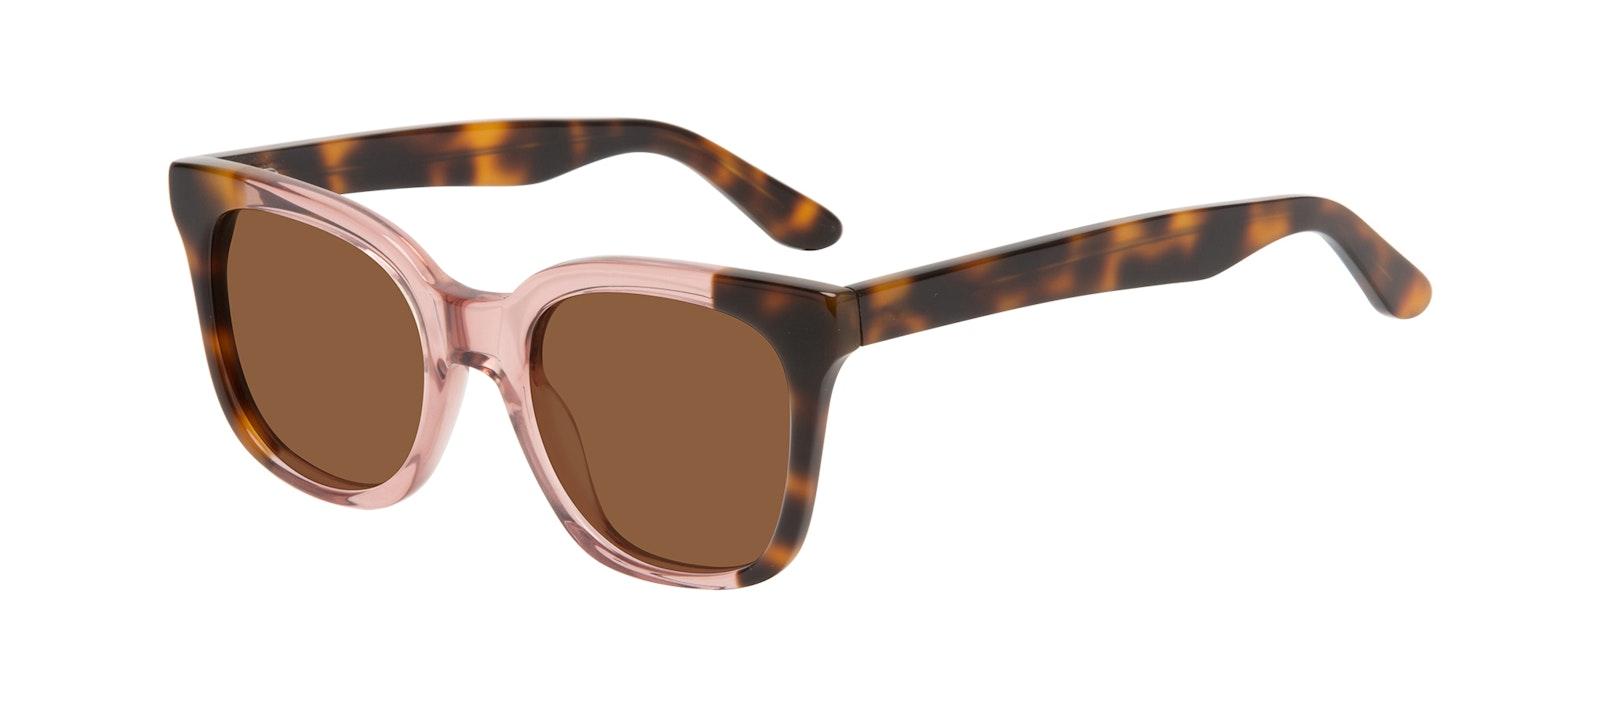 Affordable Fashion Glasses Square Sunglasses Women Mighty Rose Tort Tilt